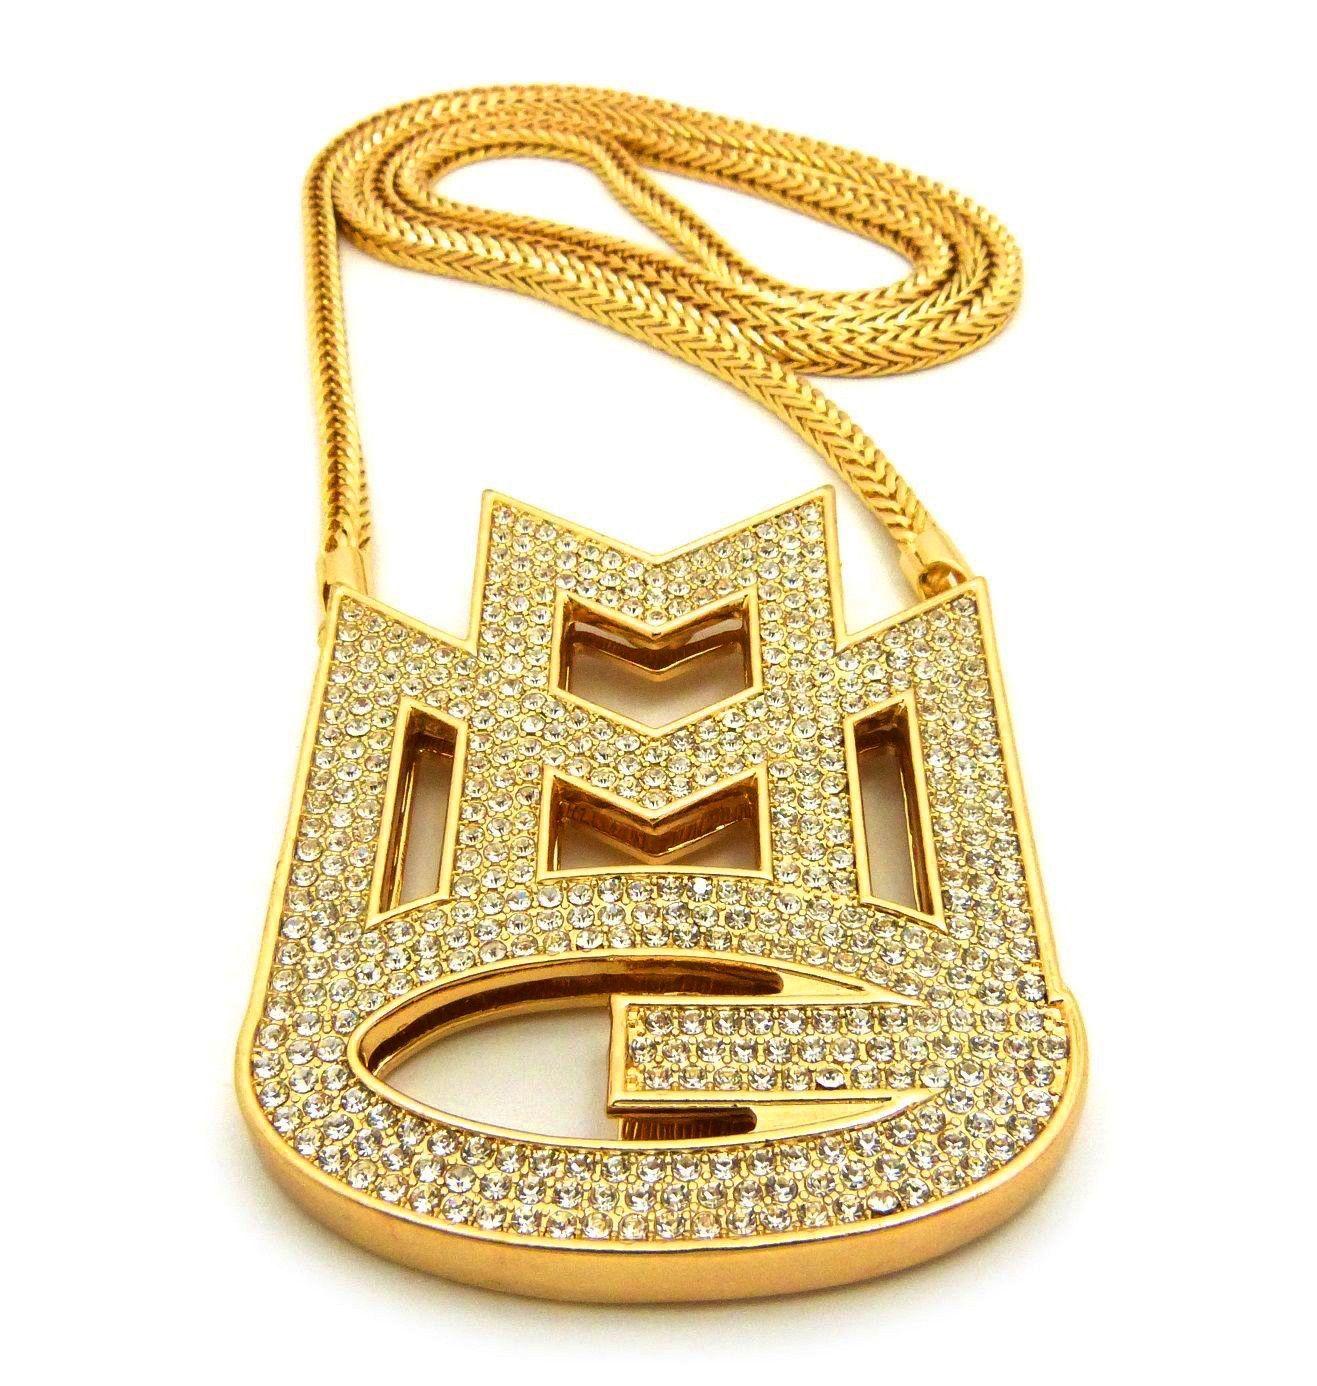 14k yellow gold mmg chain pendant rick ross rick ross 14k yellow gold mmg chain pendant rick ross aloadofball Gallery